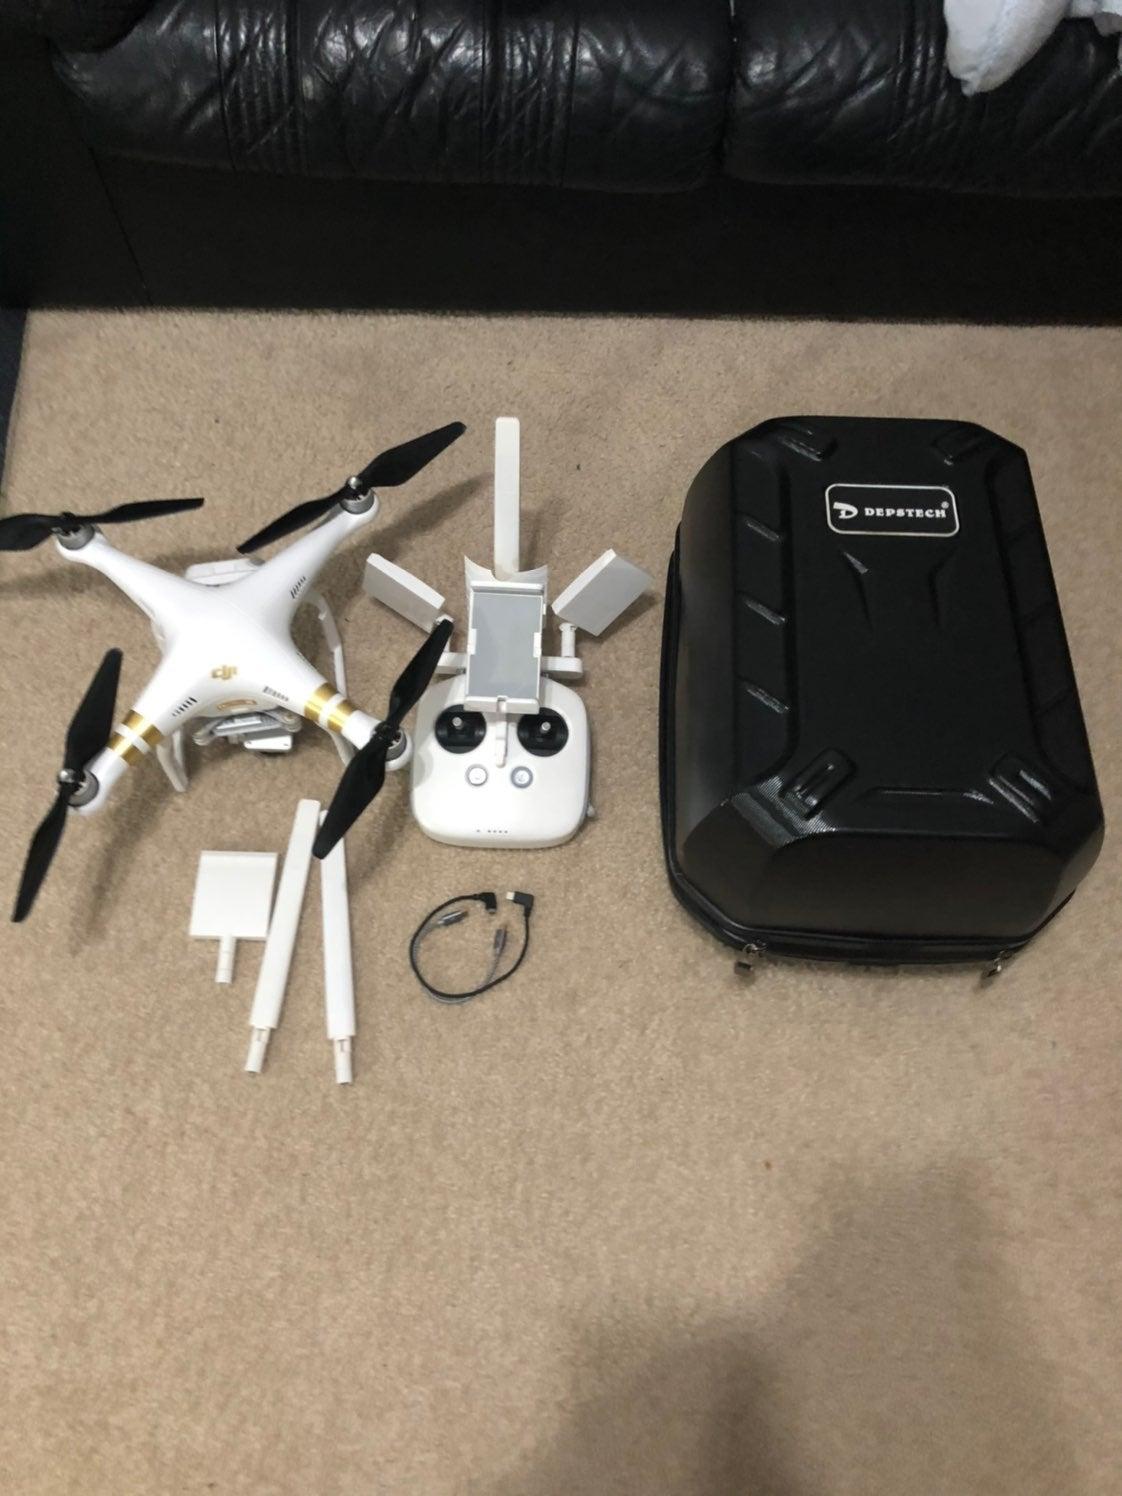 Phantom 3 4k drone PLEASE READ